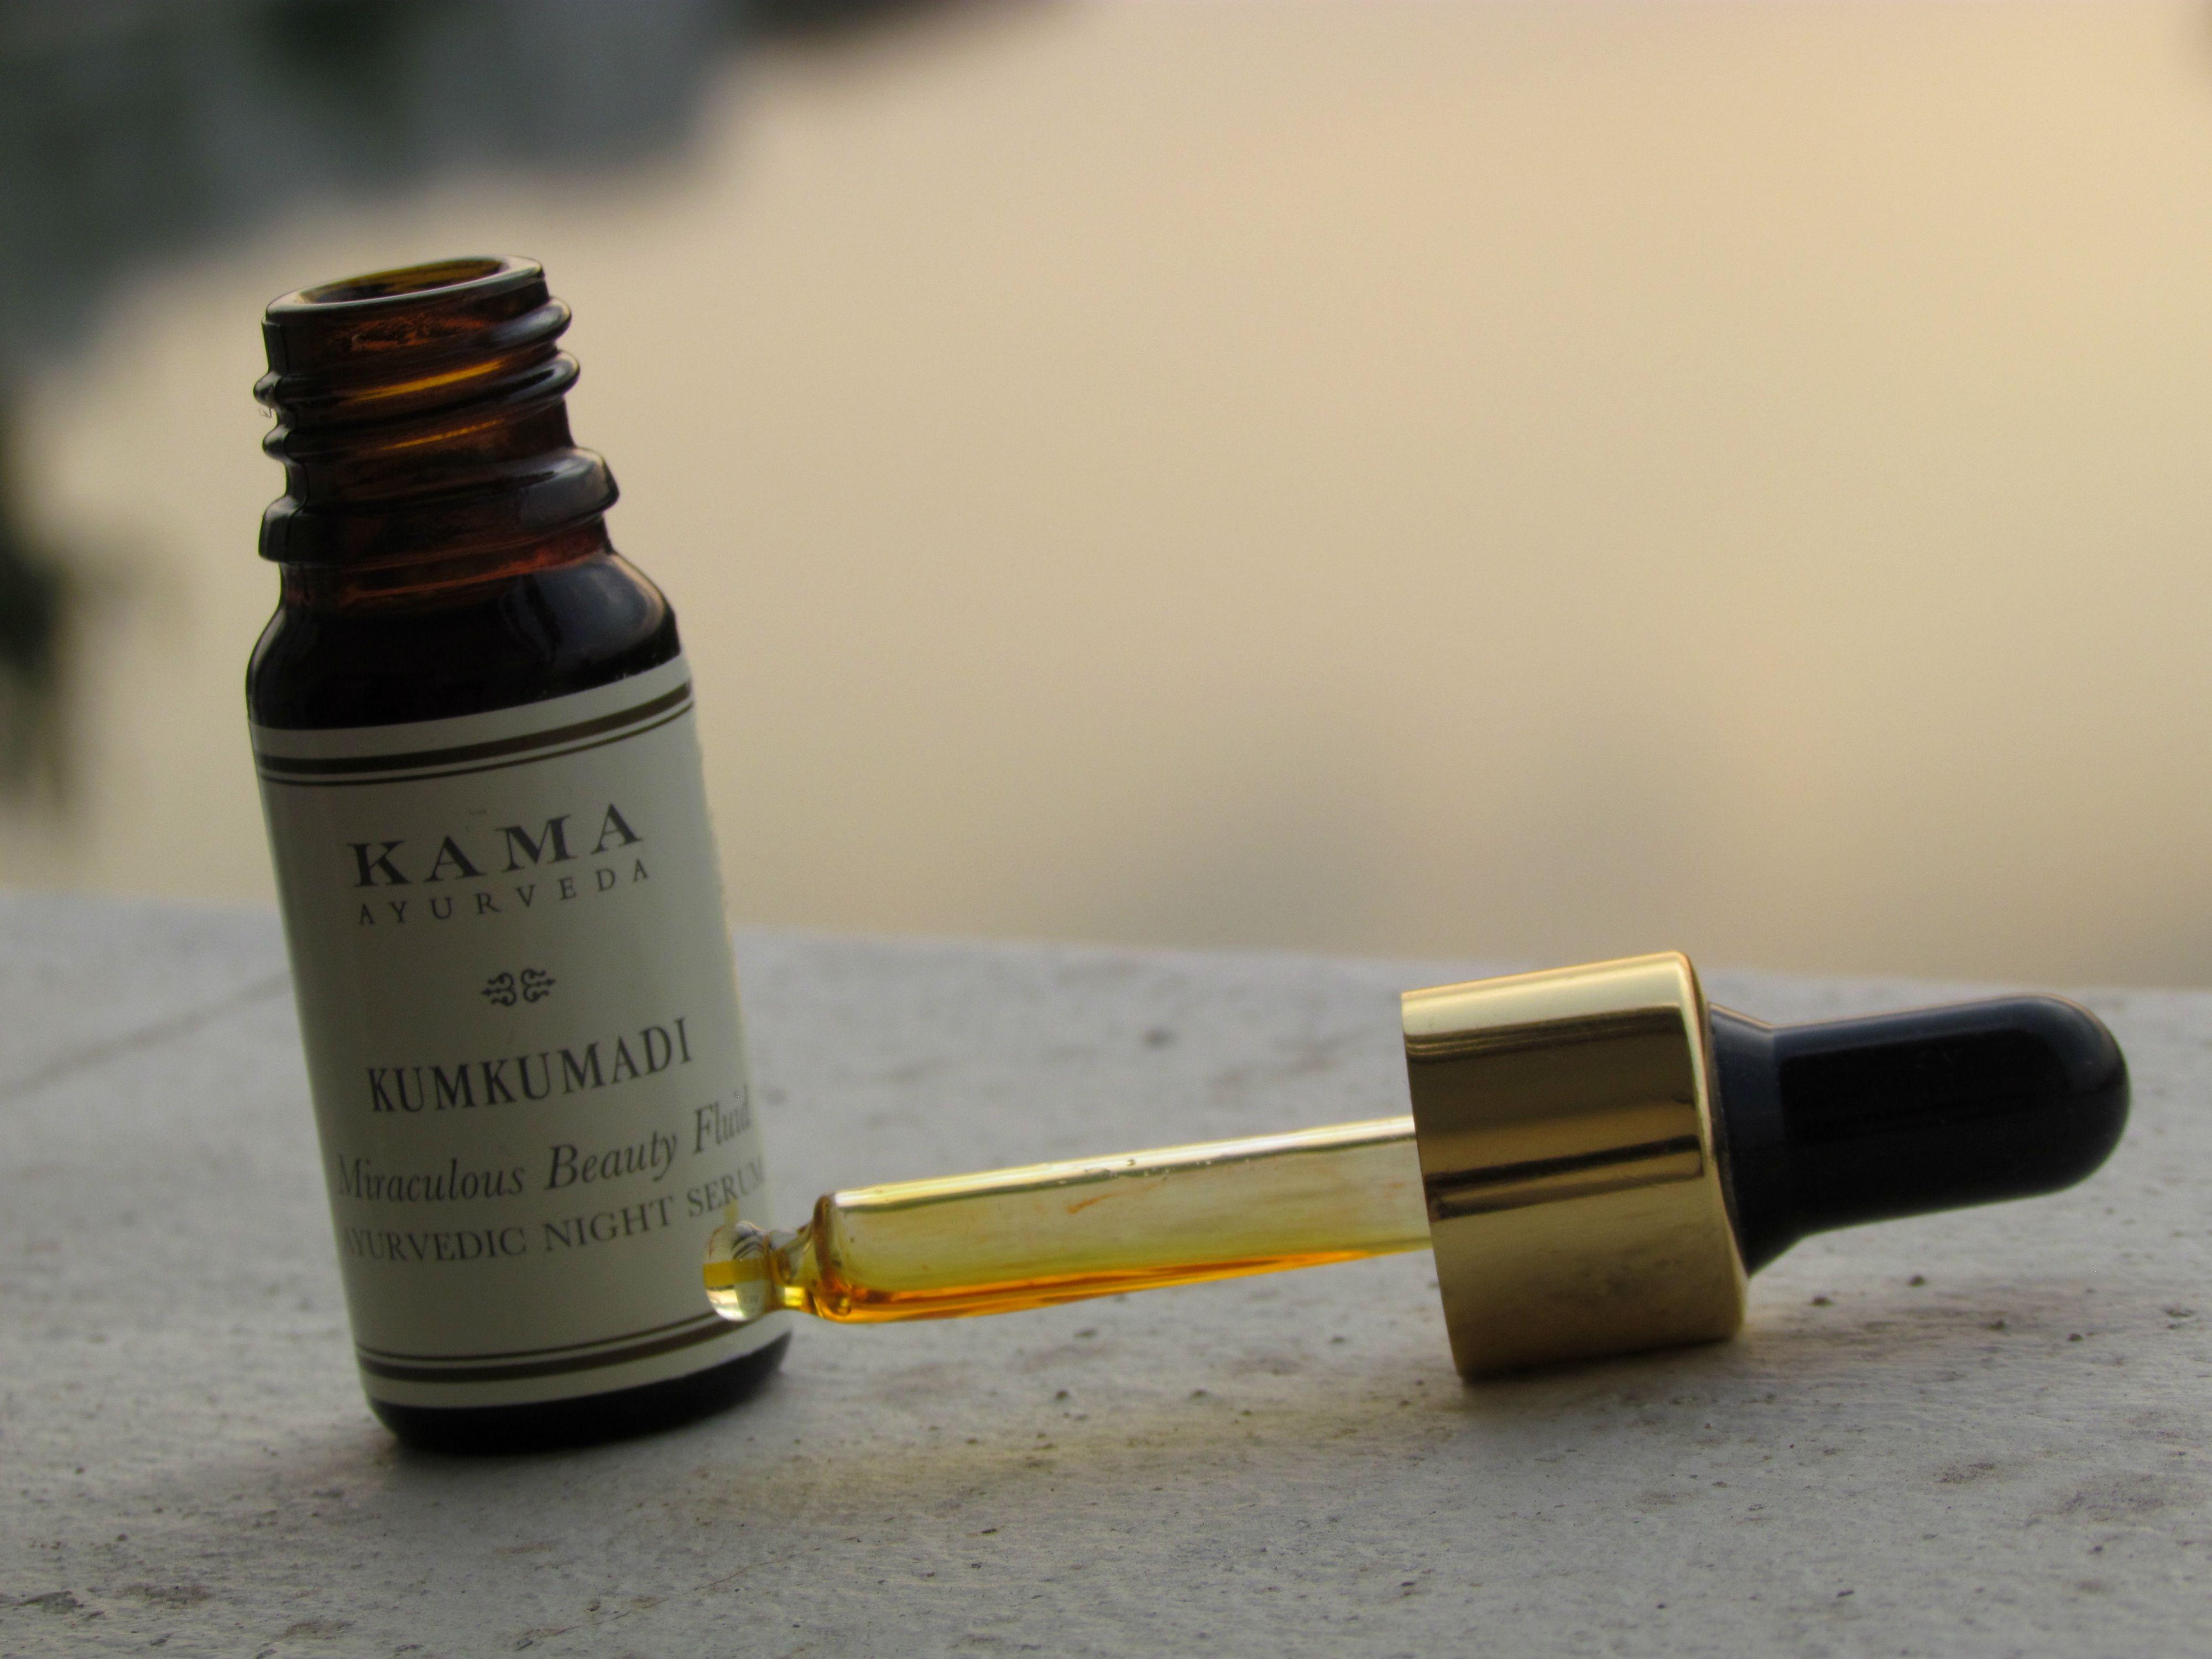 Kama Ayurveda Kumkumadi Miraculous Beauty Fluid Favorite Skincare Products Ayurveda Miraculous